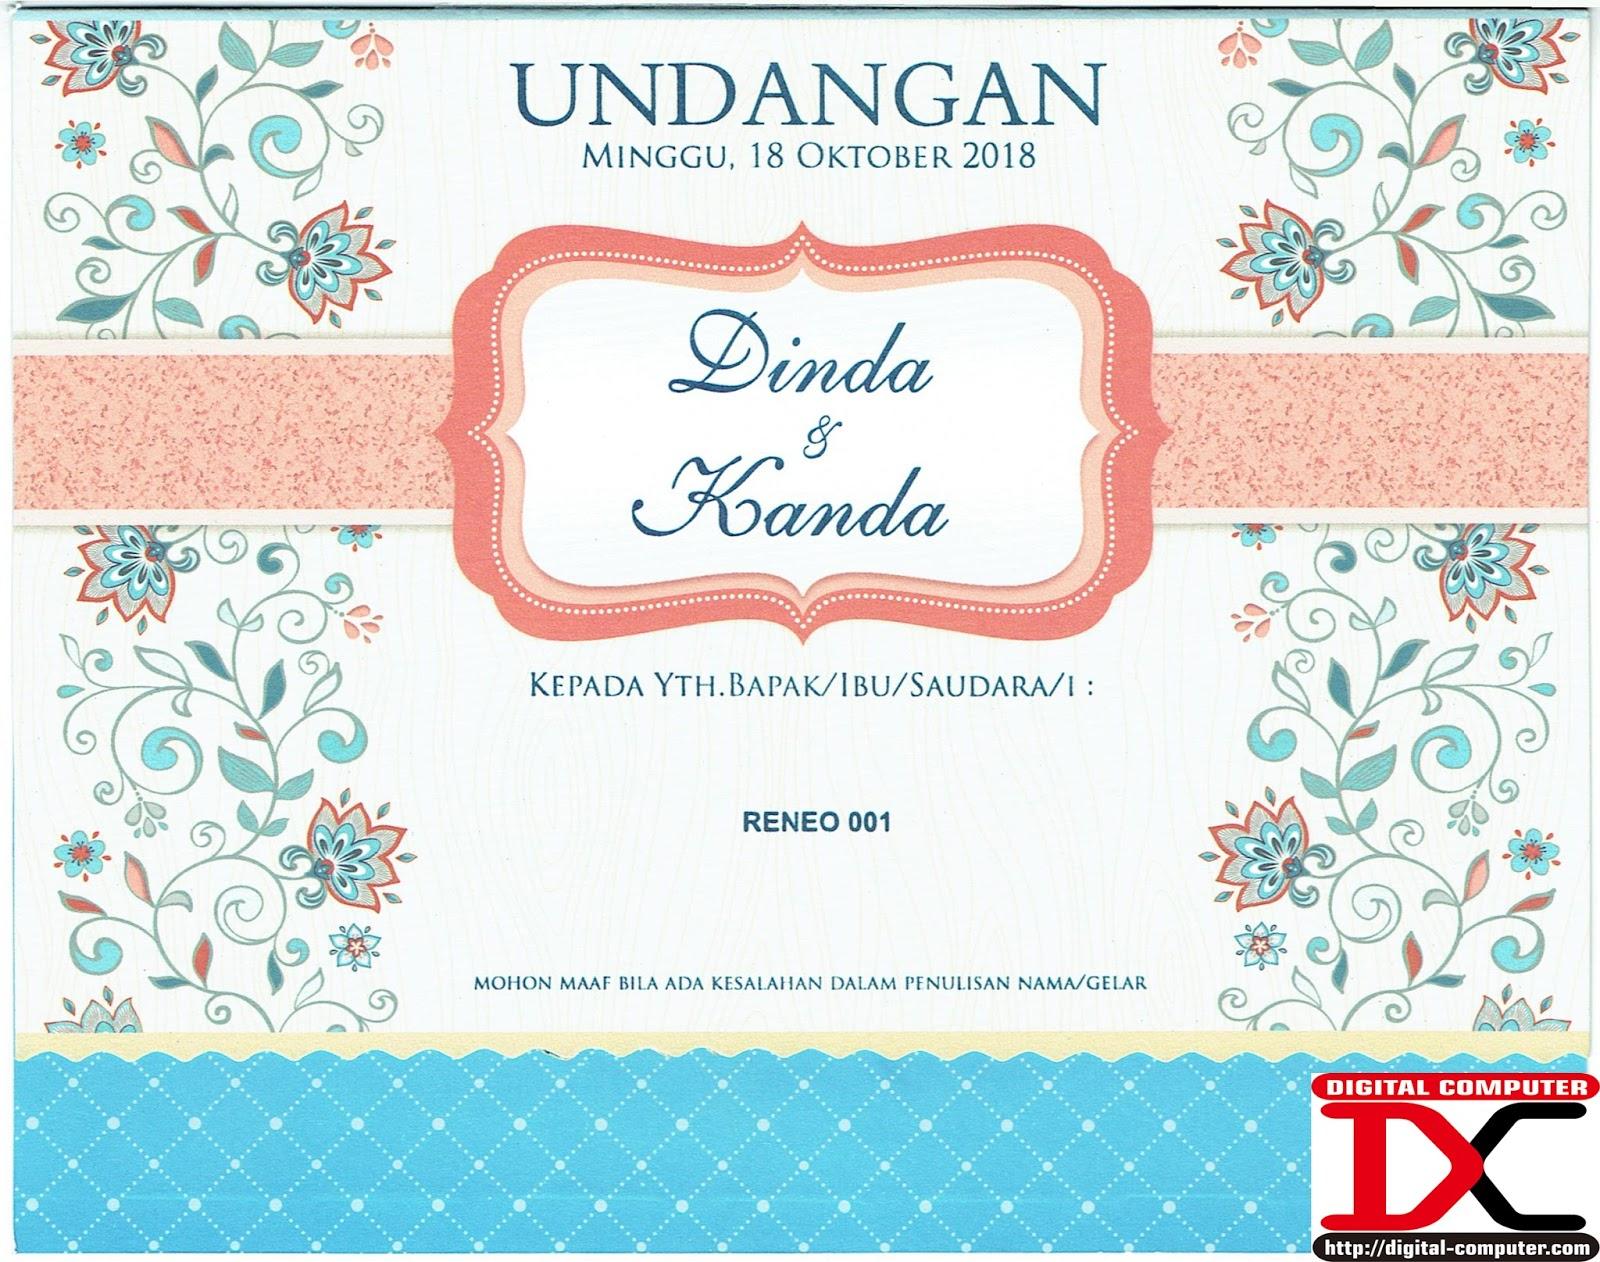 kartu undangan pernikahan, undangan pernikahan softcover, undangan pernikahan harga 2000an rupiah